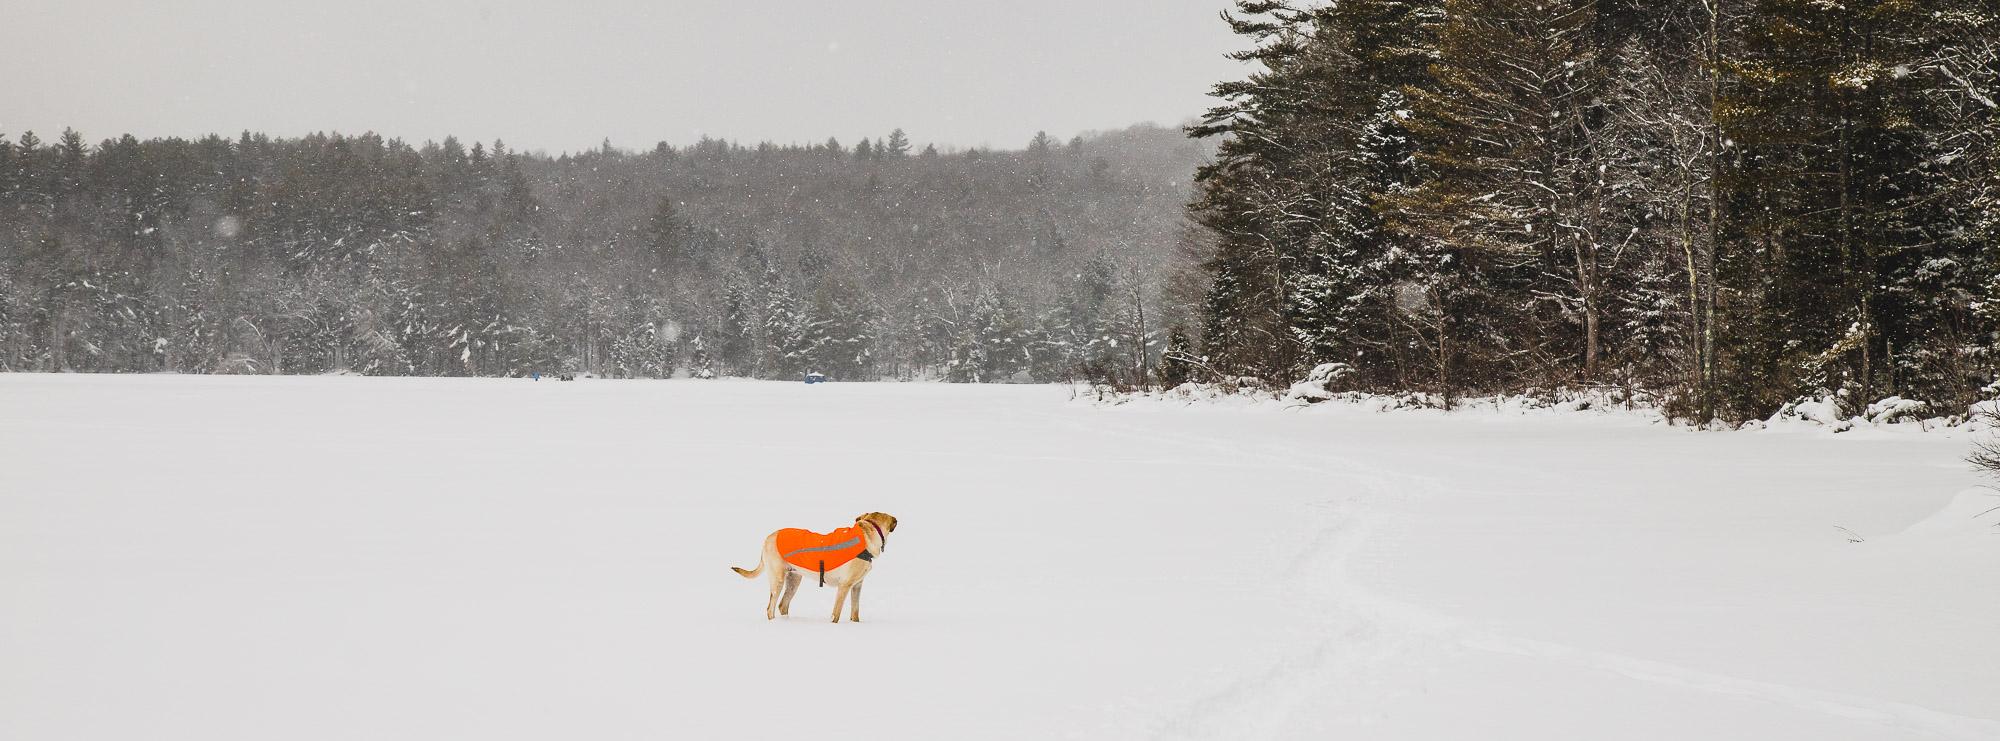 chessie on a frozen lake